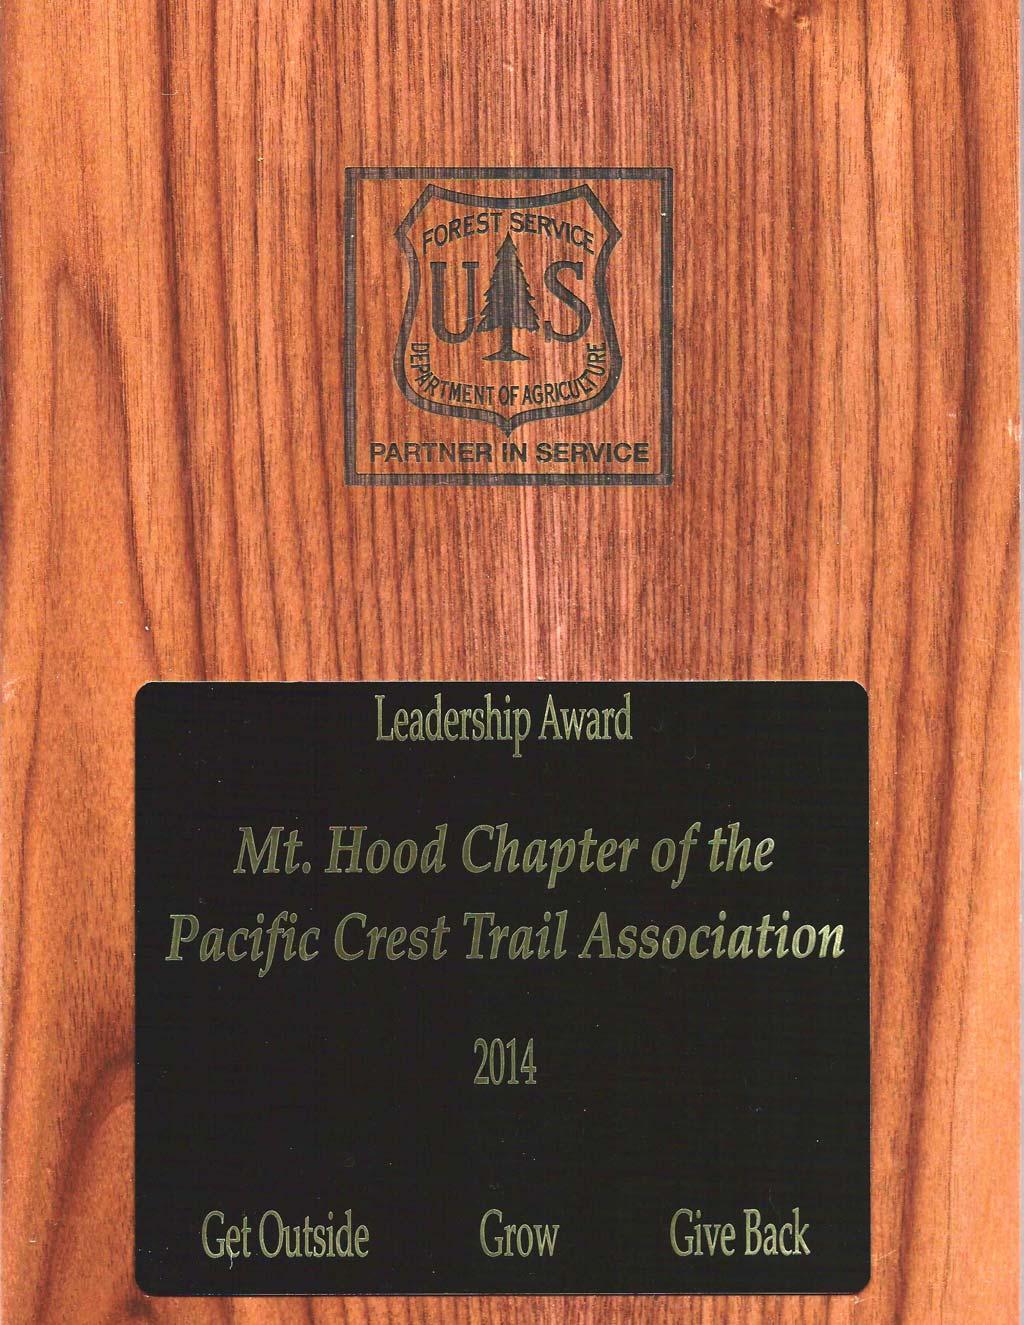 Forest Service Volunteers & Service Leadership Award